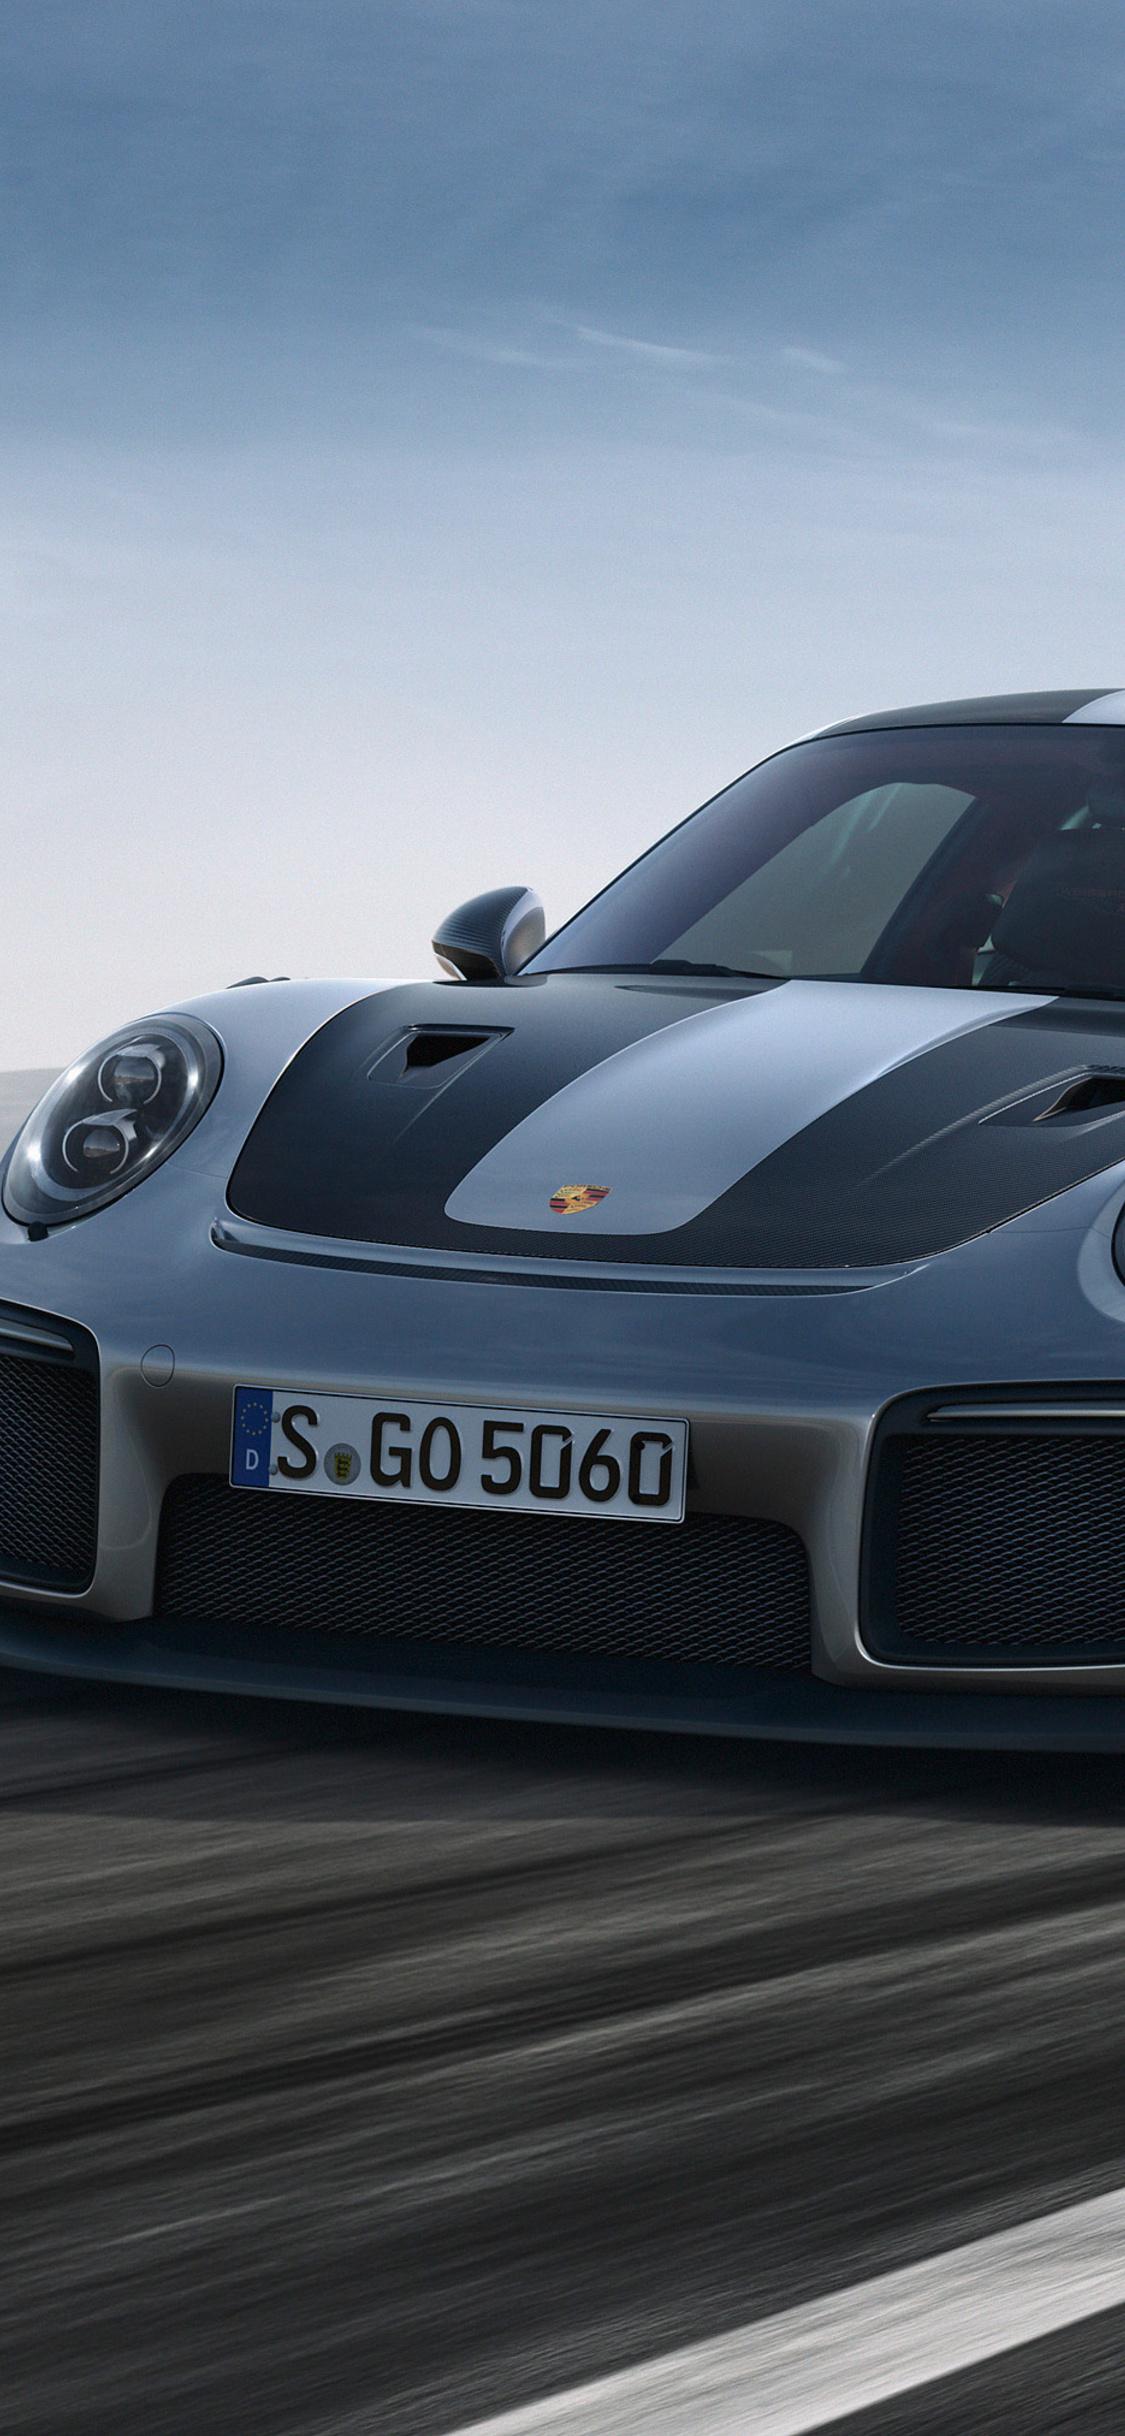 1125x2436 Porsche 911 Gt2 Rs Iphone Xs Iphone 10 Iphone X Hd 4k